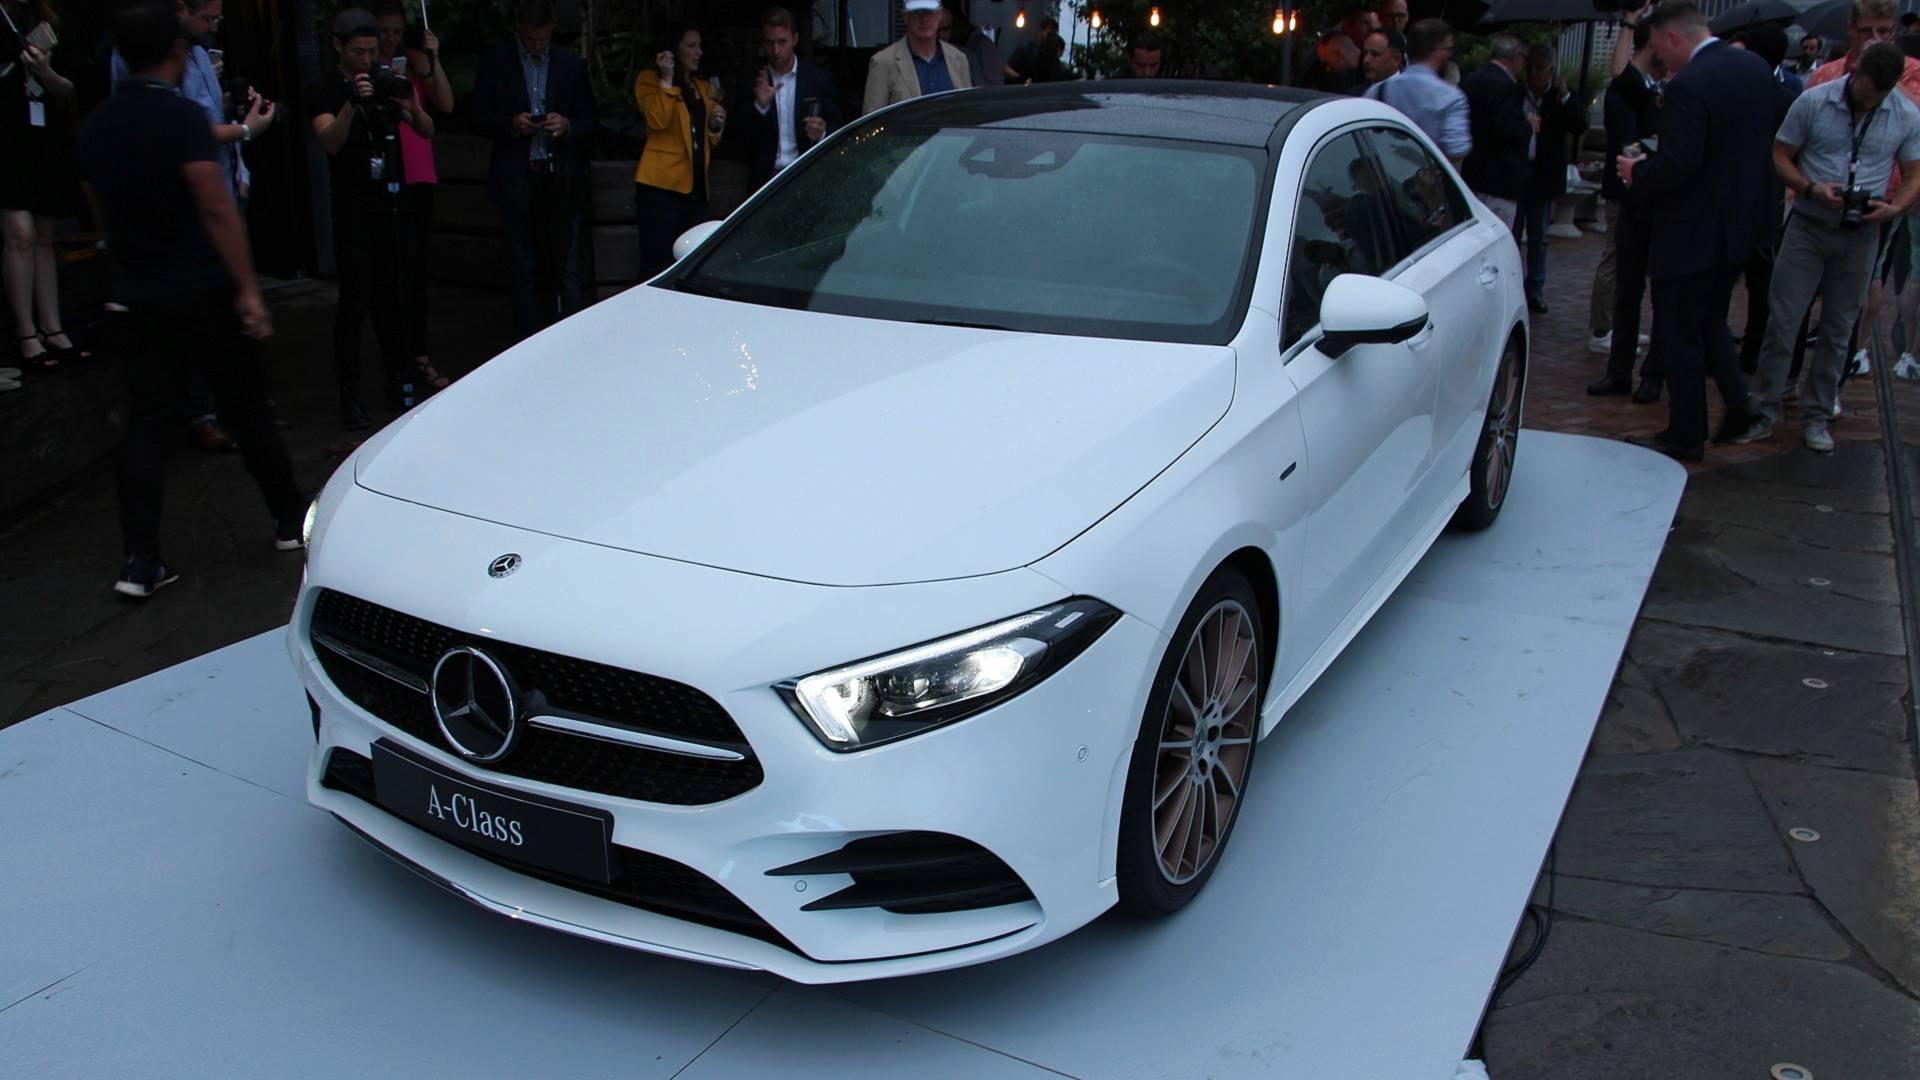 2018 - [Mercedes-Benz] Classe A Sedan - Page 6 2019-mercedes-benz-a-class-sedan